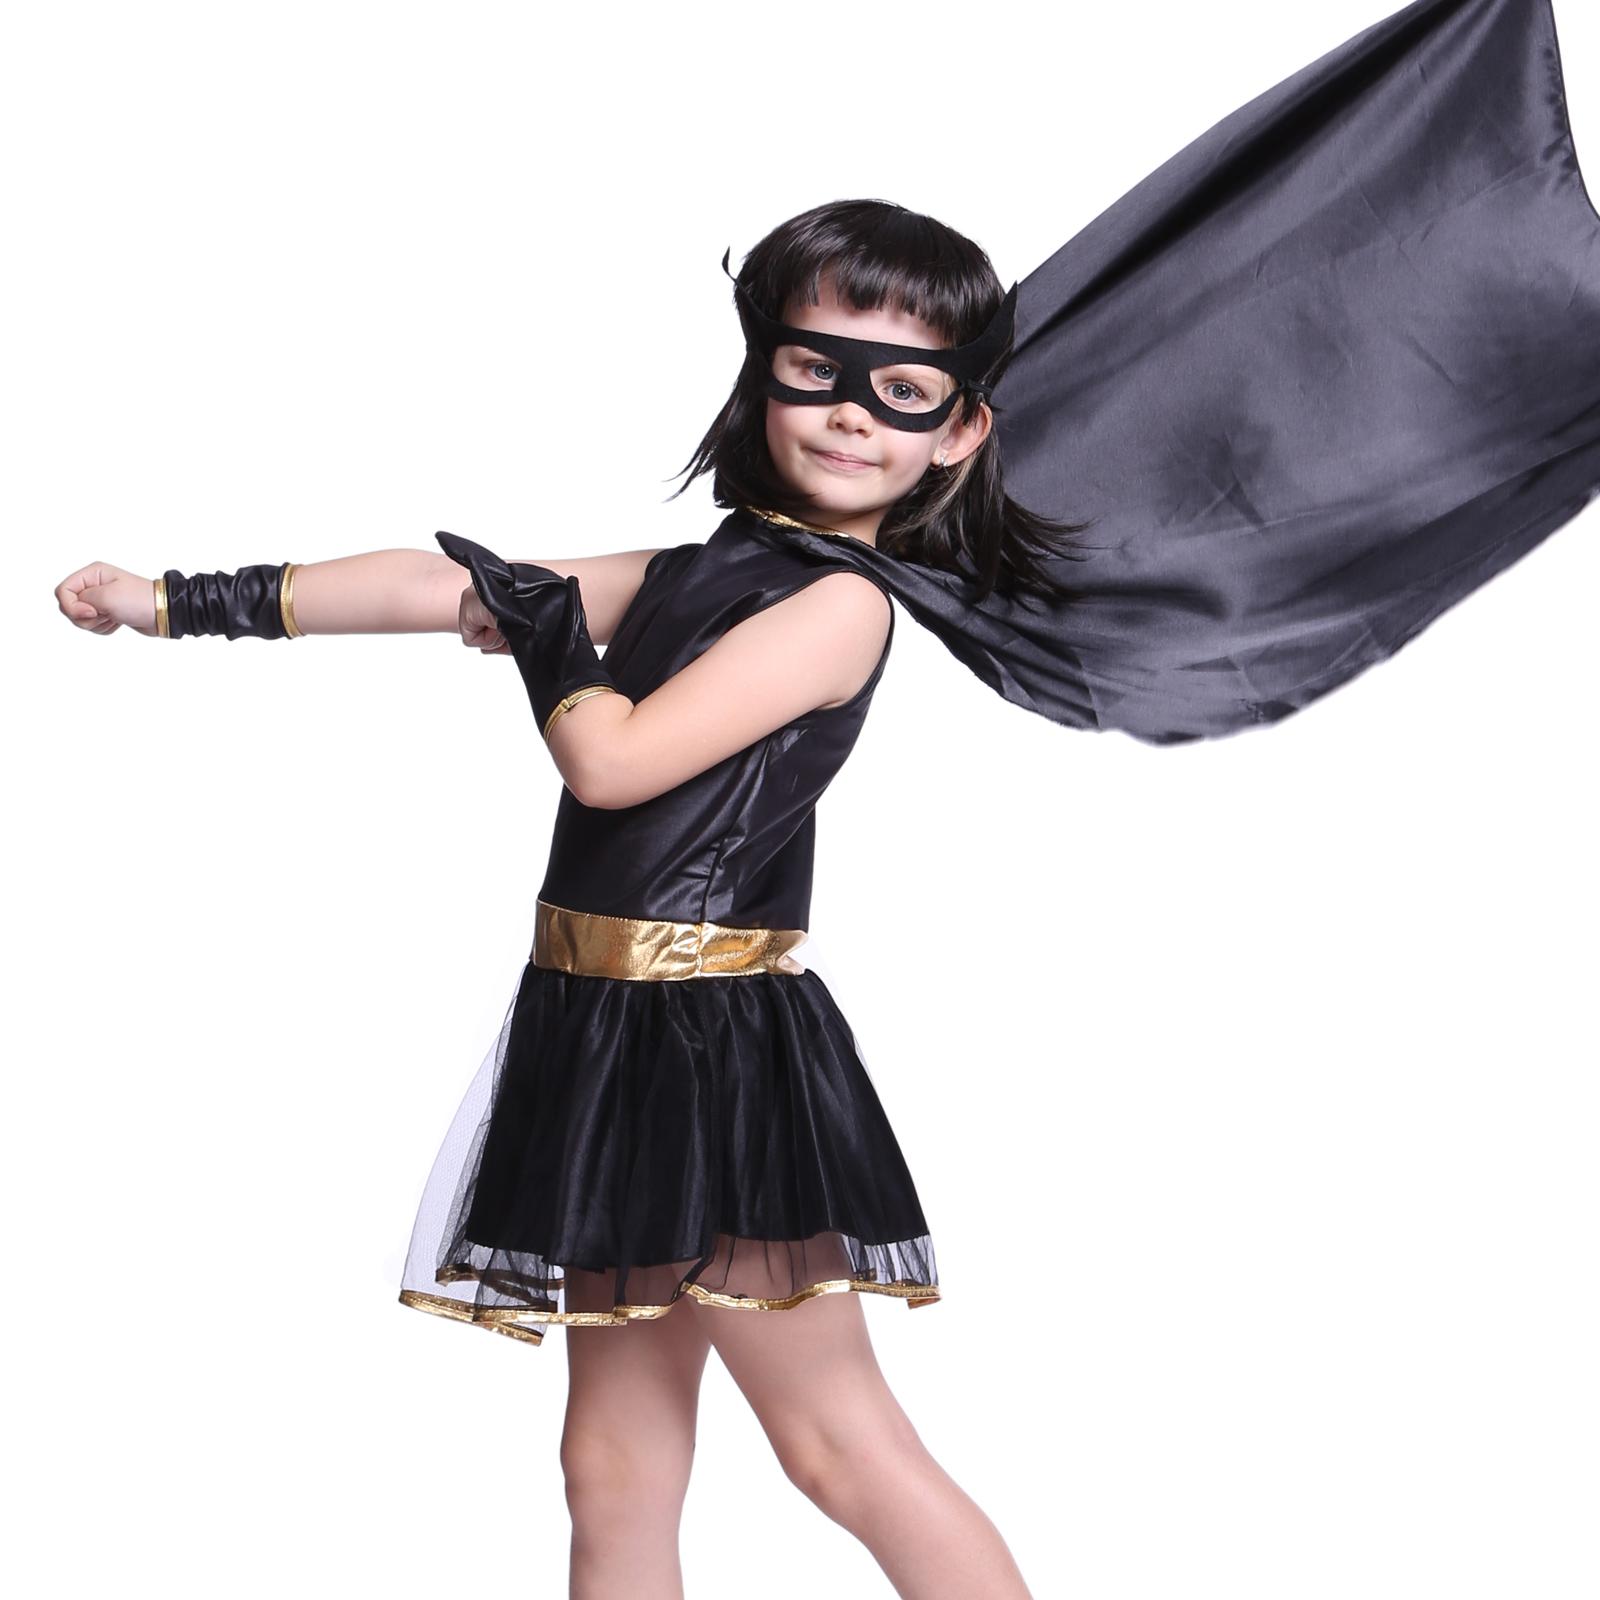 Girls Toddler Batman Batgirl Costume Kids Party Fancy  sc 1 st  Meningrey & Batman Costume For Girls - Meningrey